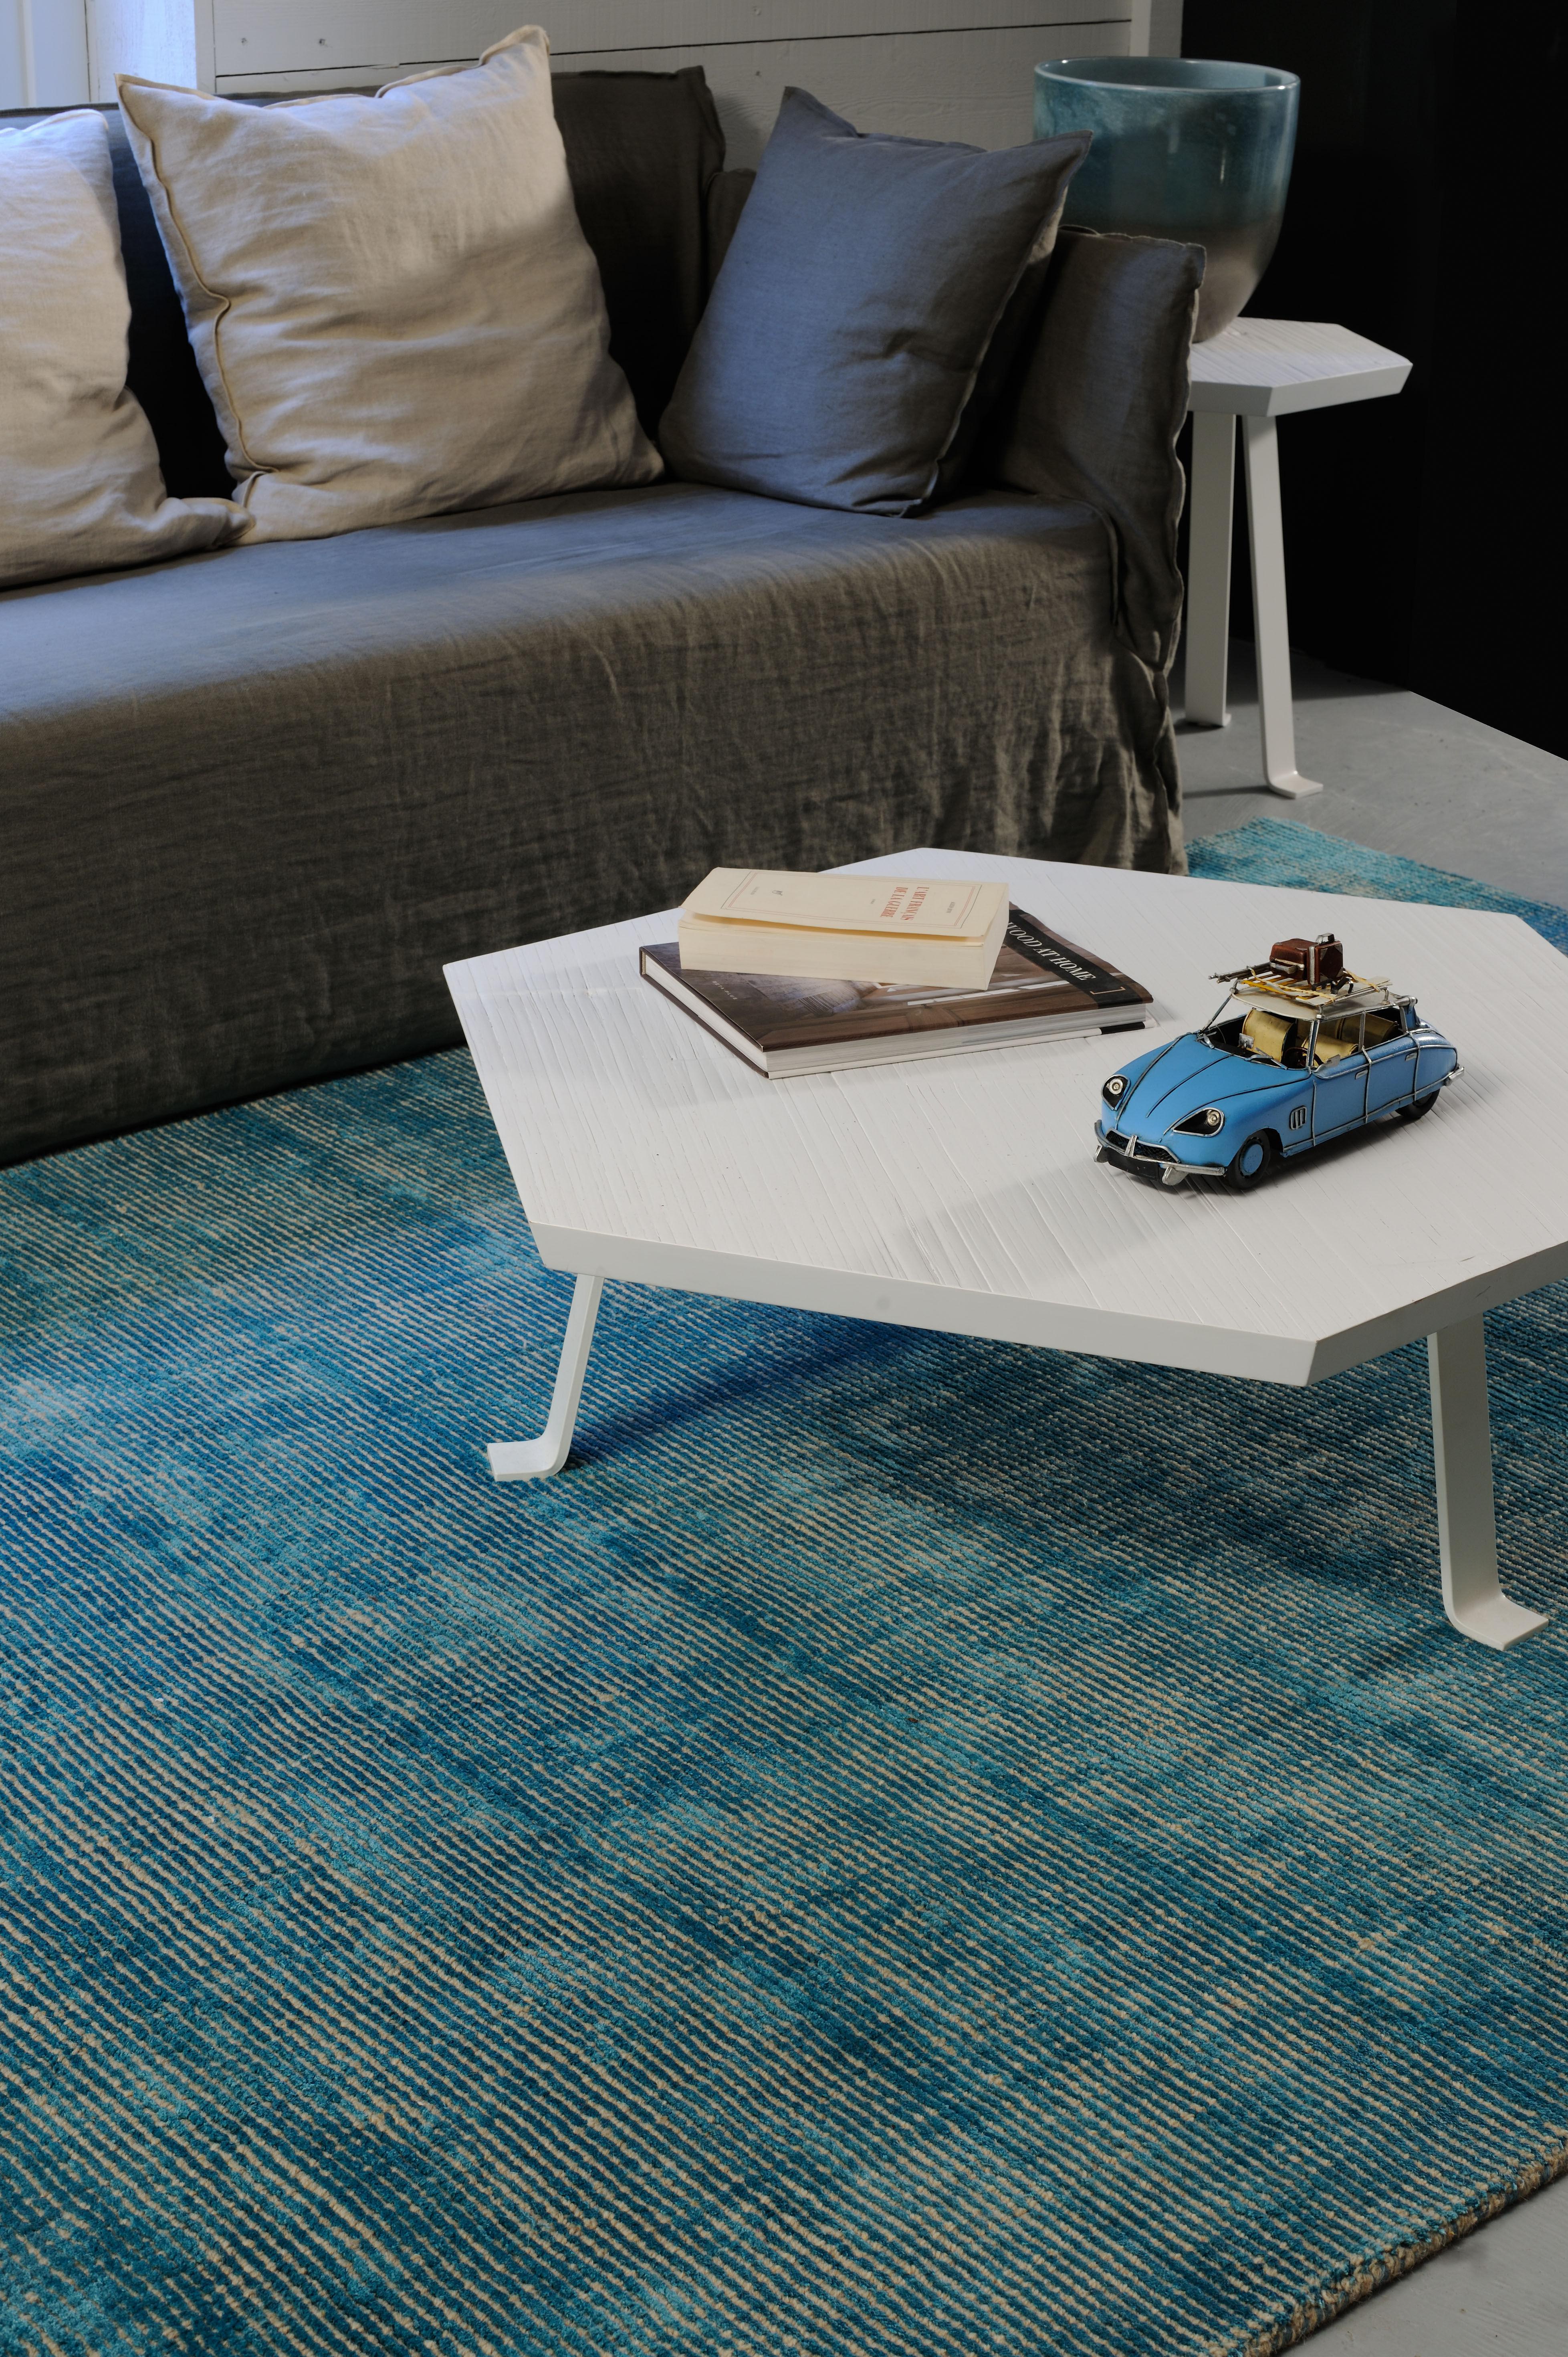 tapis voyage 200 x 300 cm tiss main 200 x 300 cm turquoise toulemonde bochart. Black Bedroom Furniture Sets. Home Design Ideas